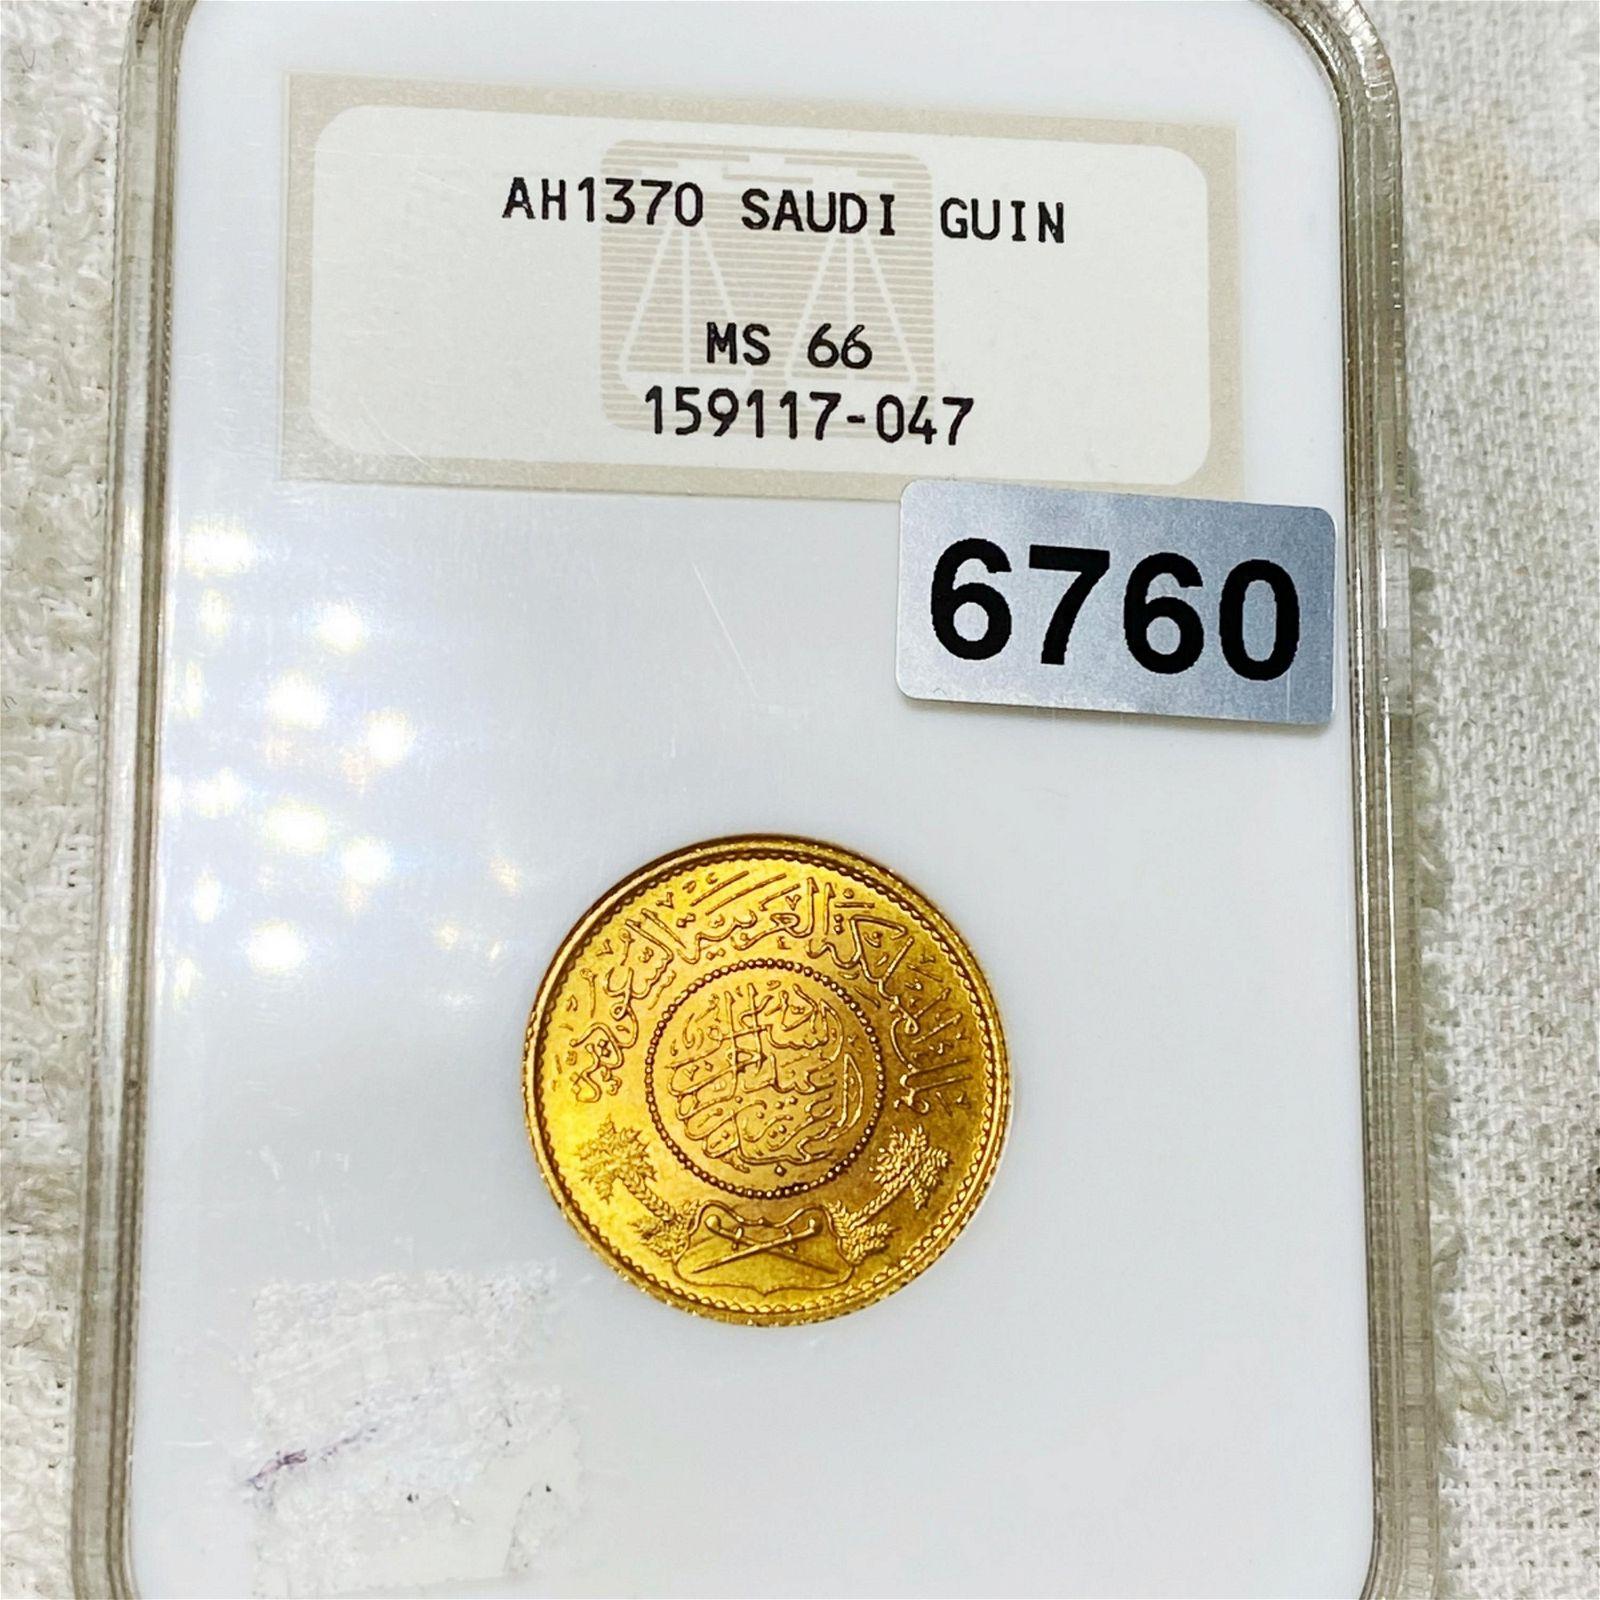 1370 Suidi Gold Guin NGC - MS66